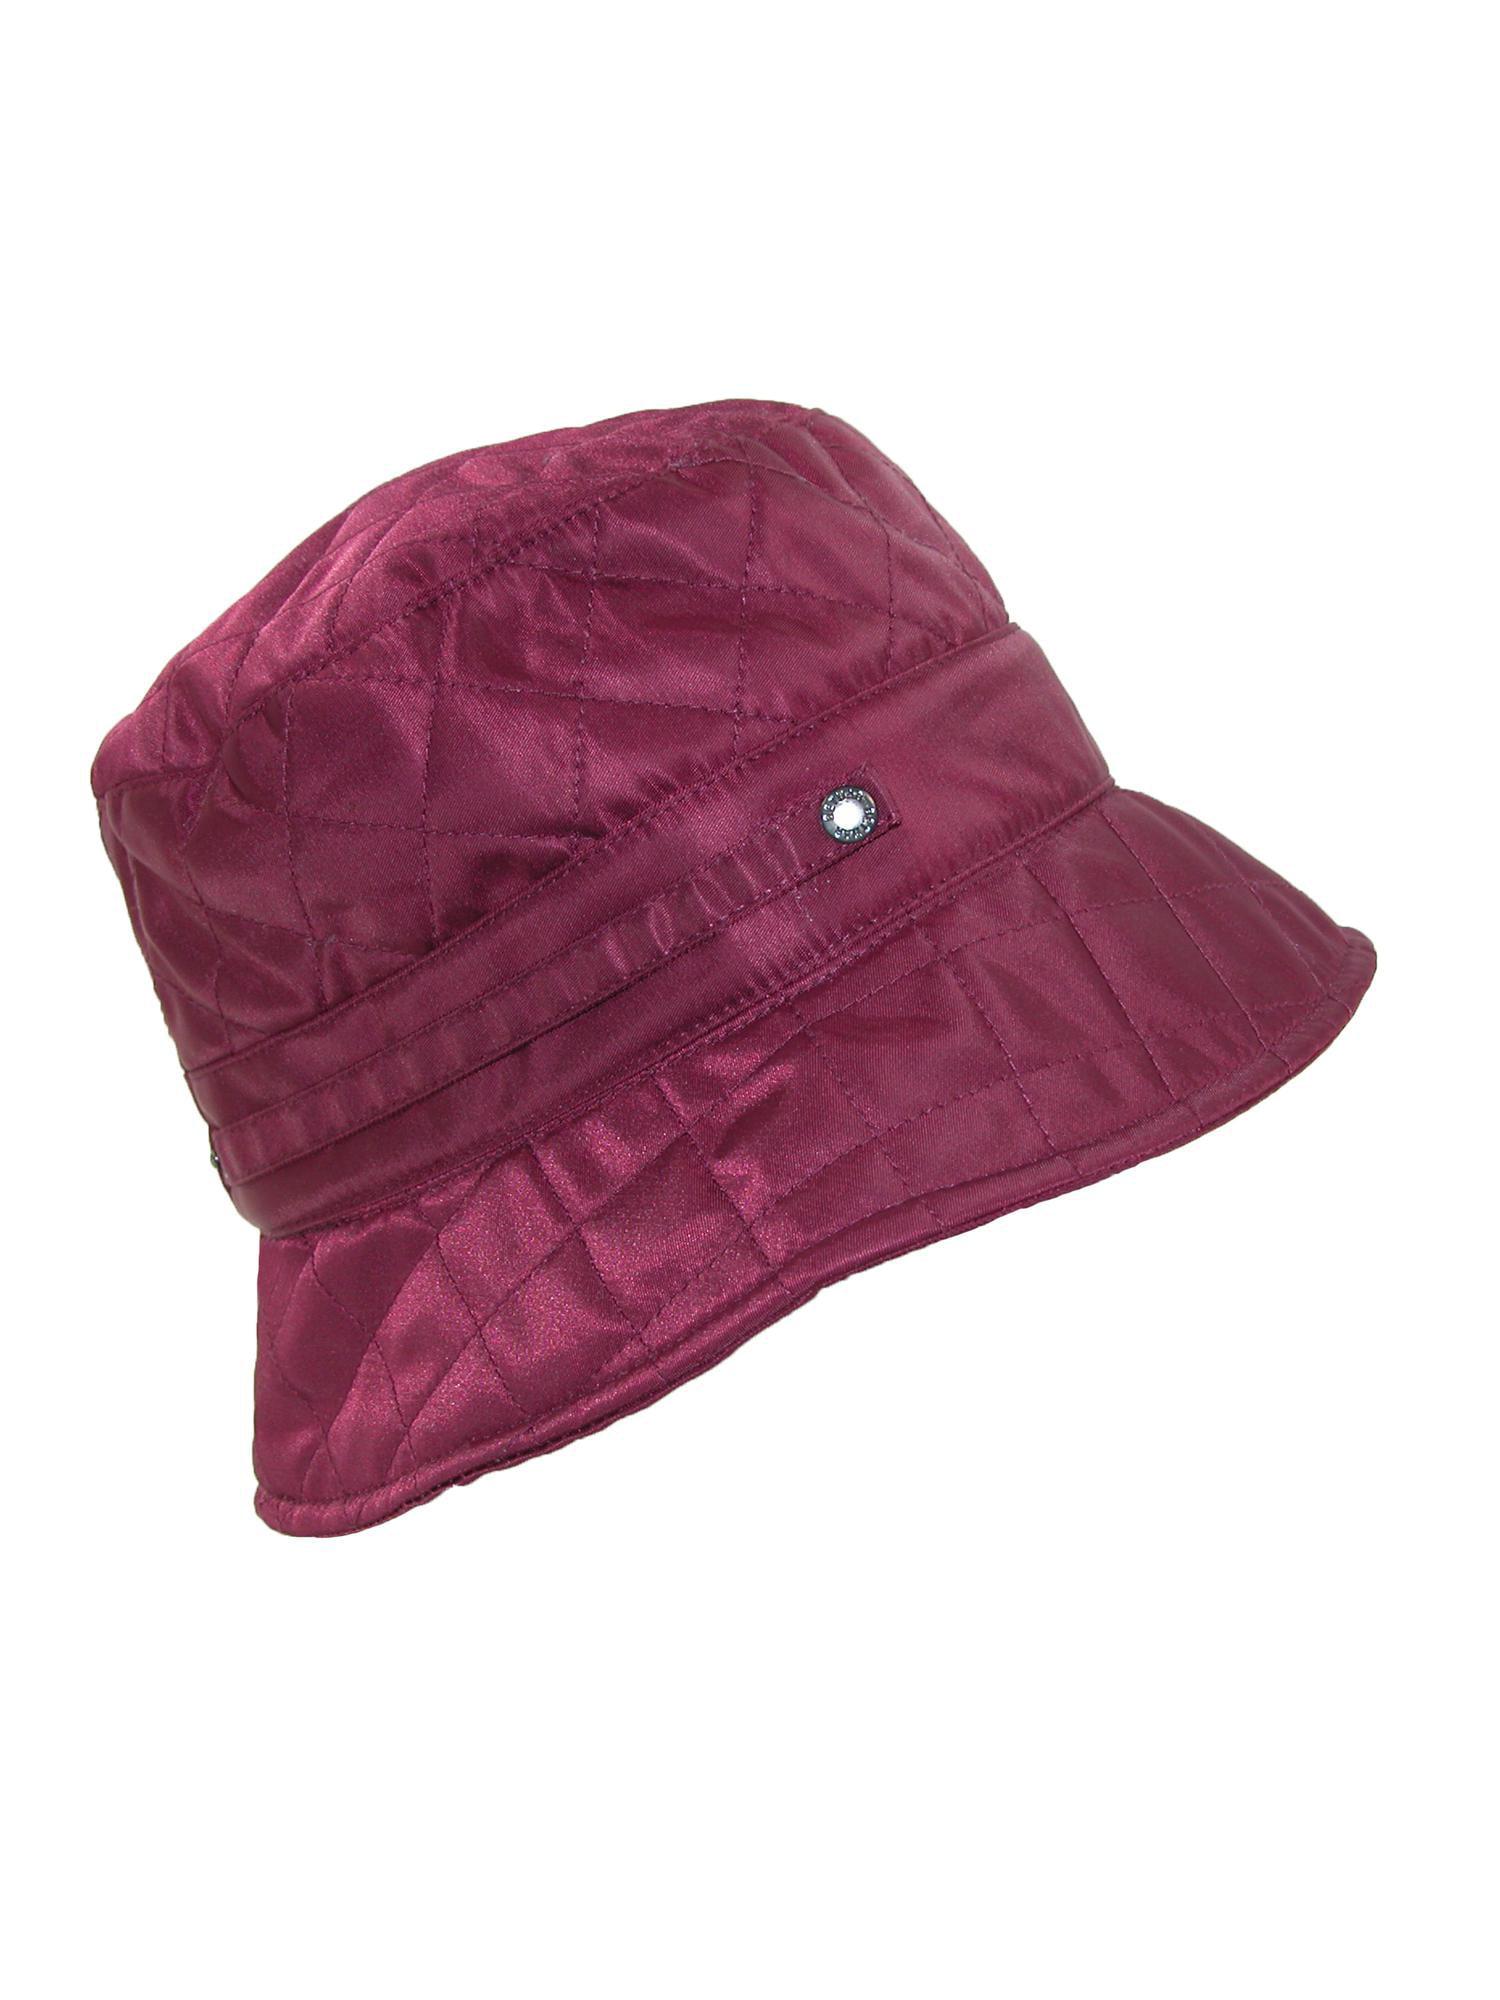 e73fb50bddf Betmar - Betmar Size one size Women s Nylon Quilted Waterproof Bucket Rain  Hat - Walmart.com